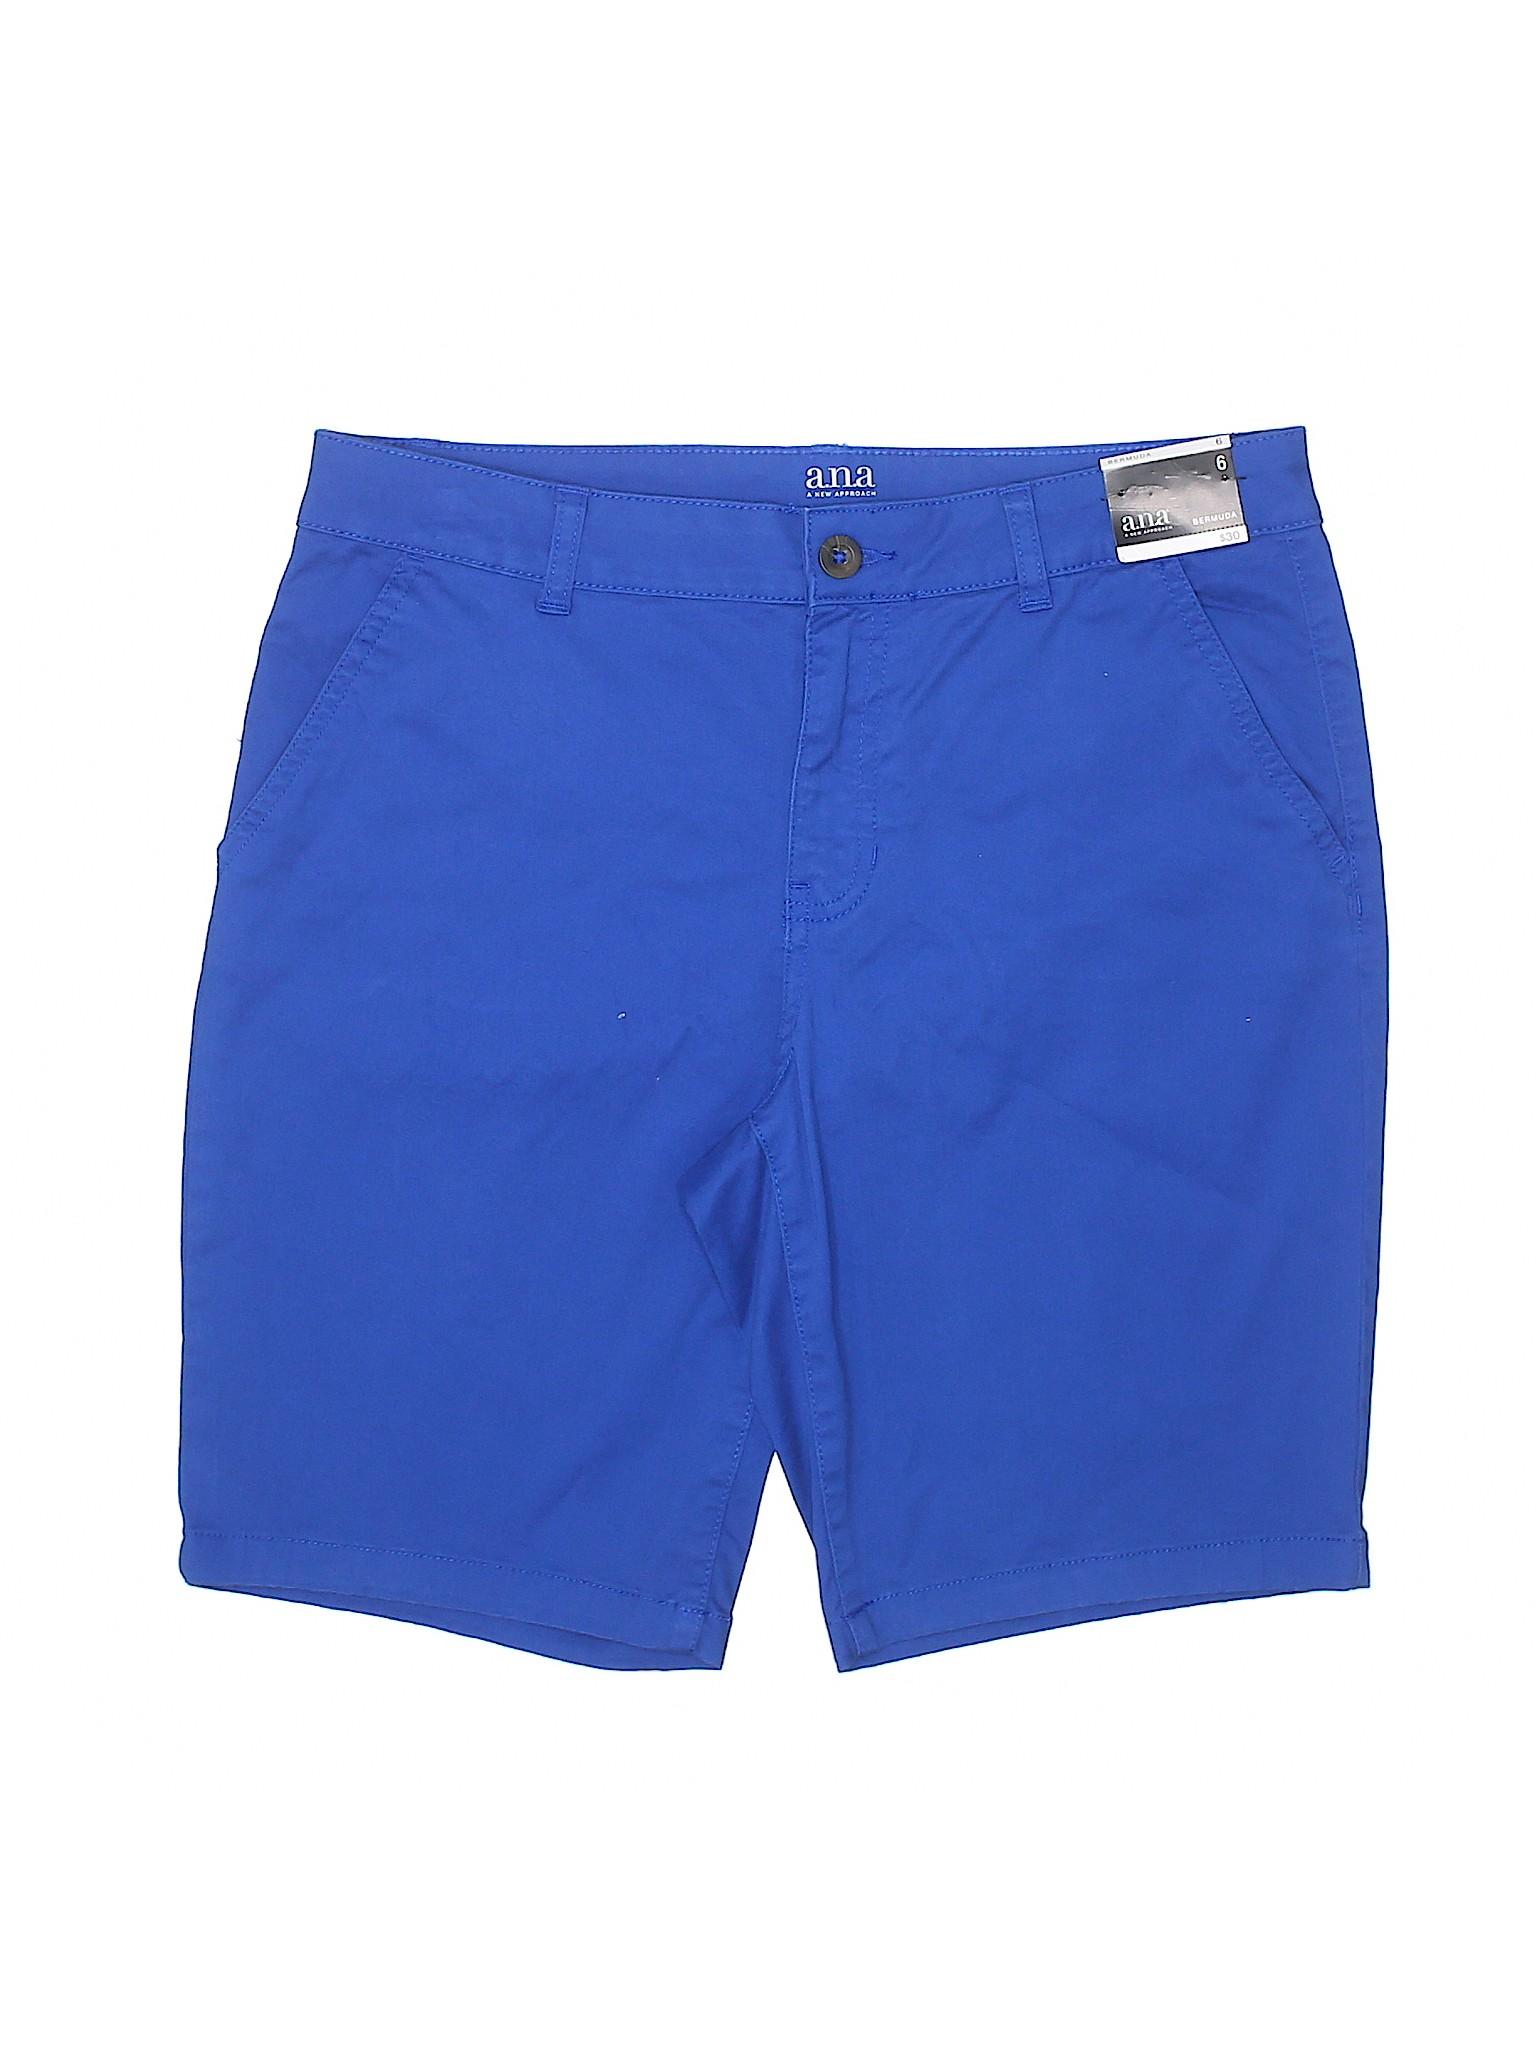 Khaki a Boutique Shorts n a New A Approach BYBwdqr